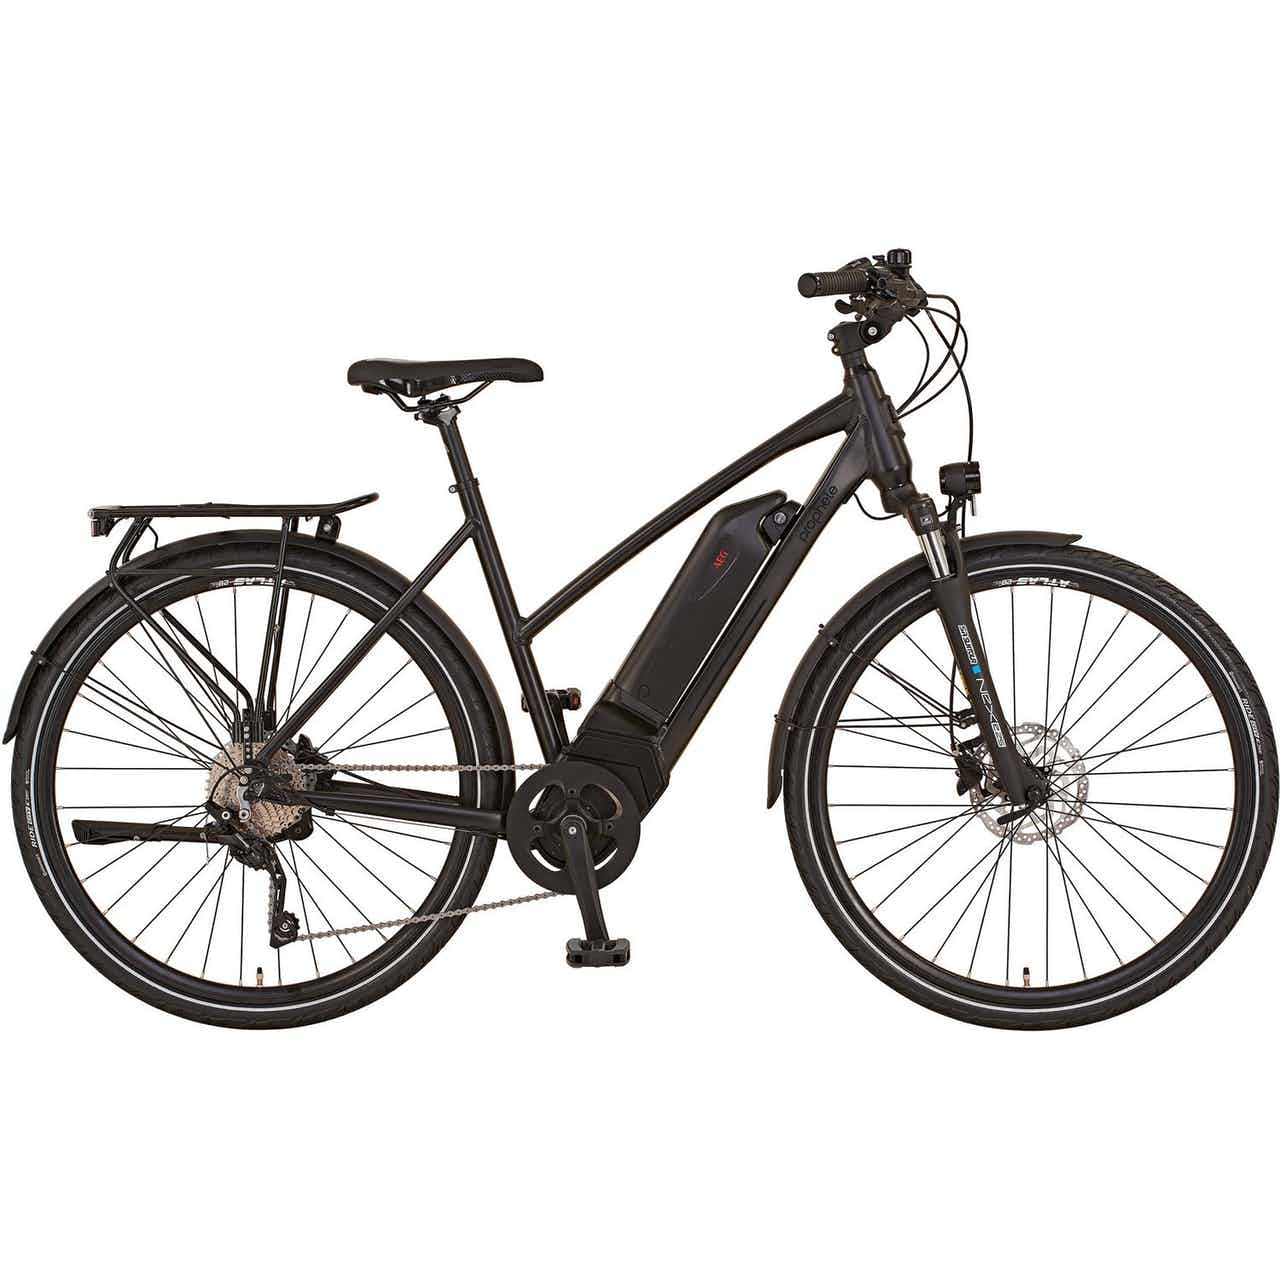 "Prophete E-Bike Damen Trekking-Fahrrad 28"" Entdecker 20.ETT.30"